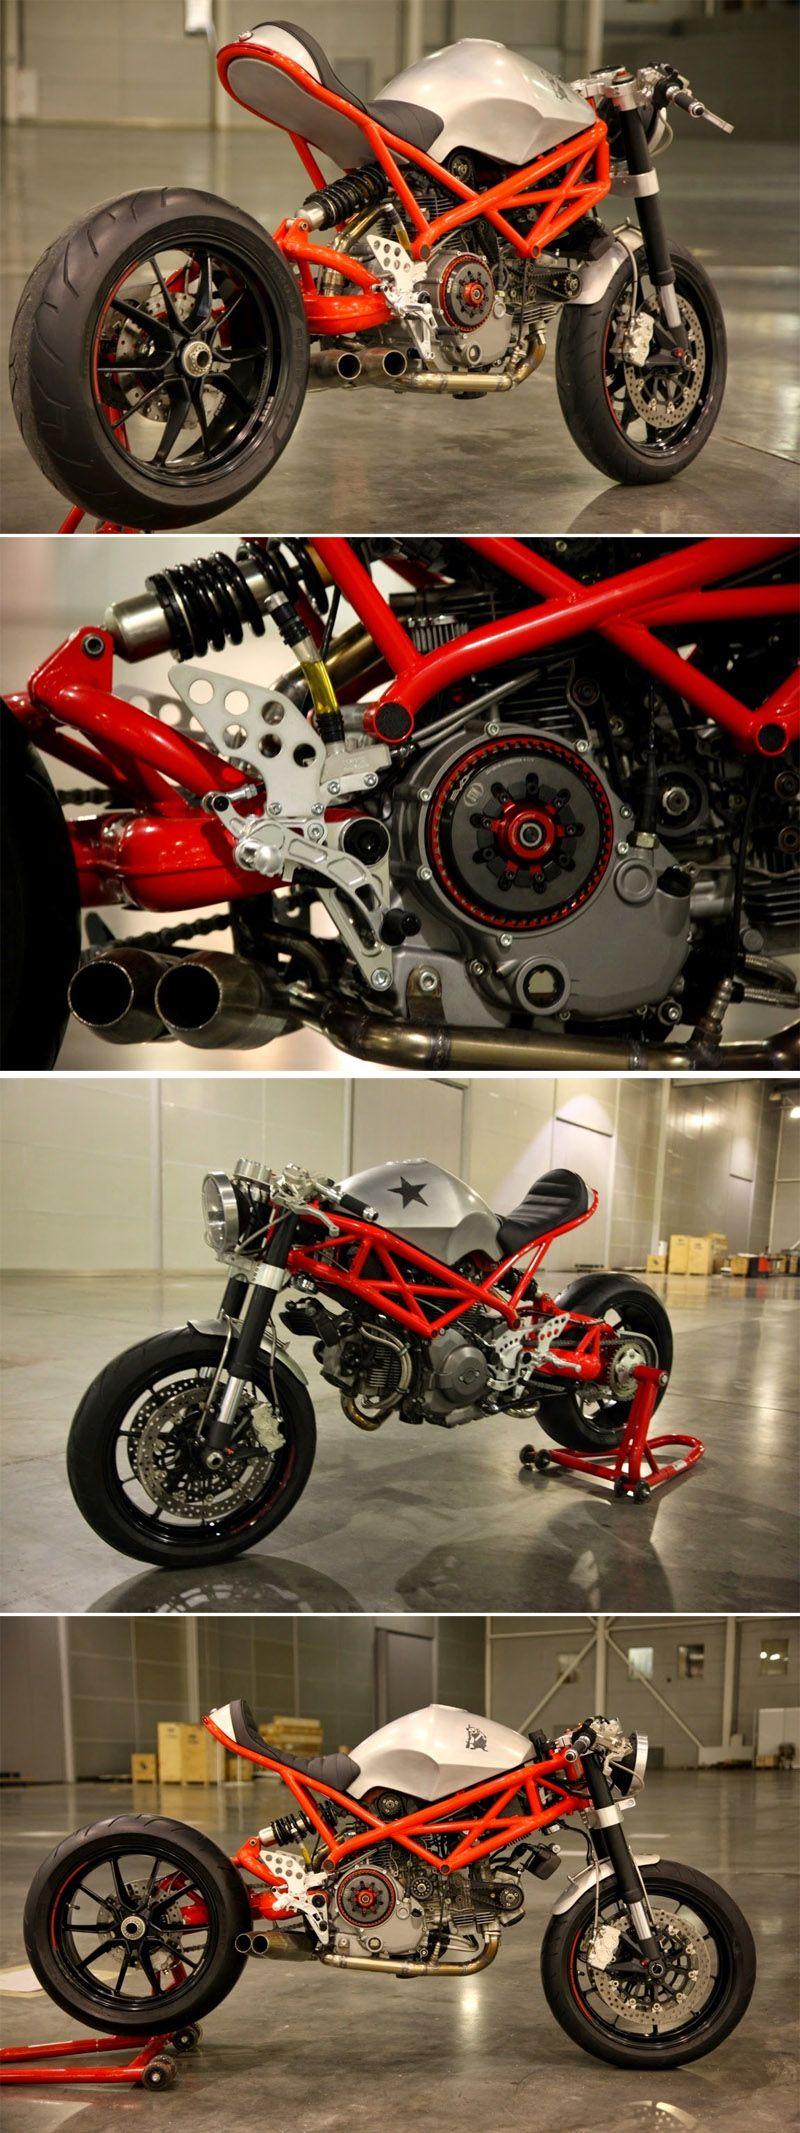 Baixar fotos de motos 1100 95